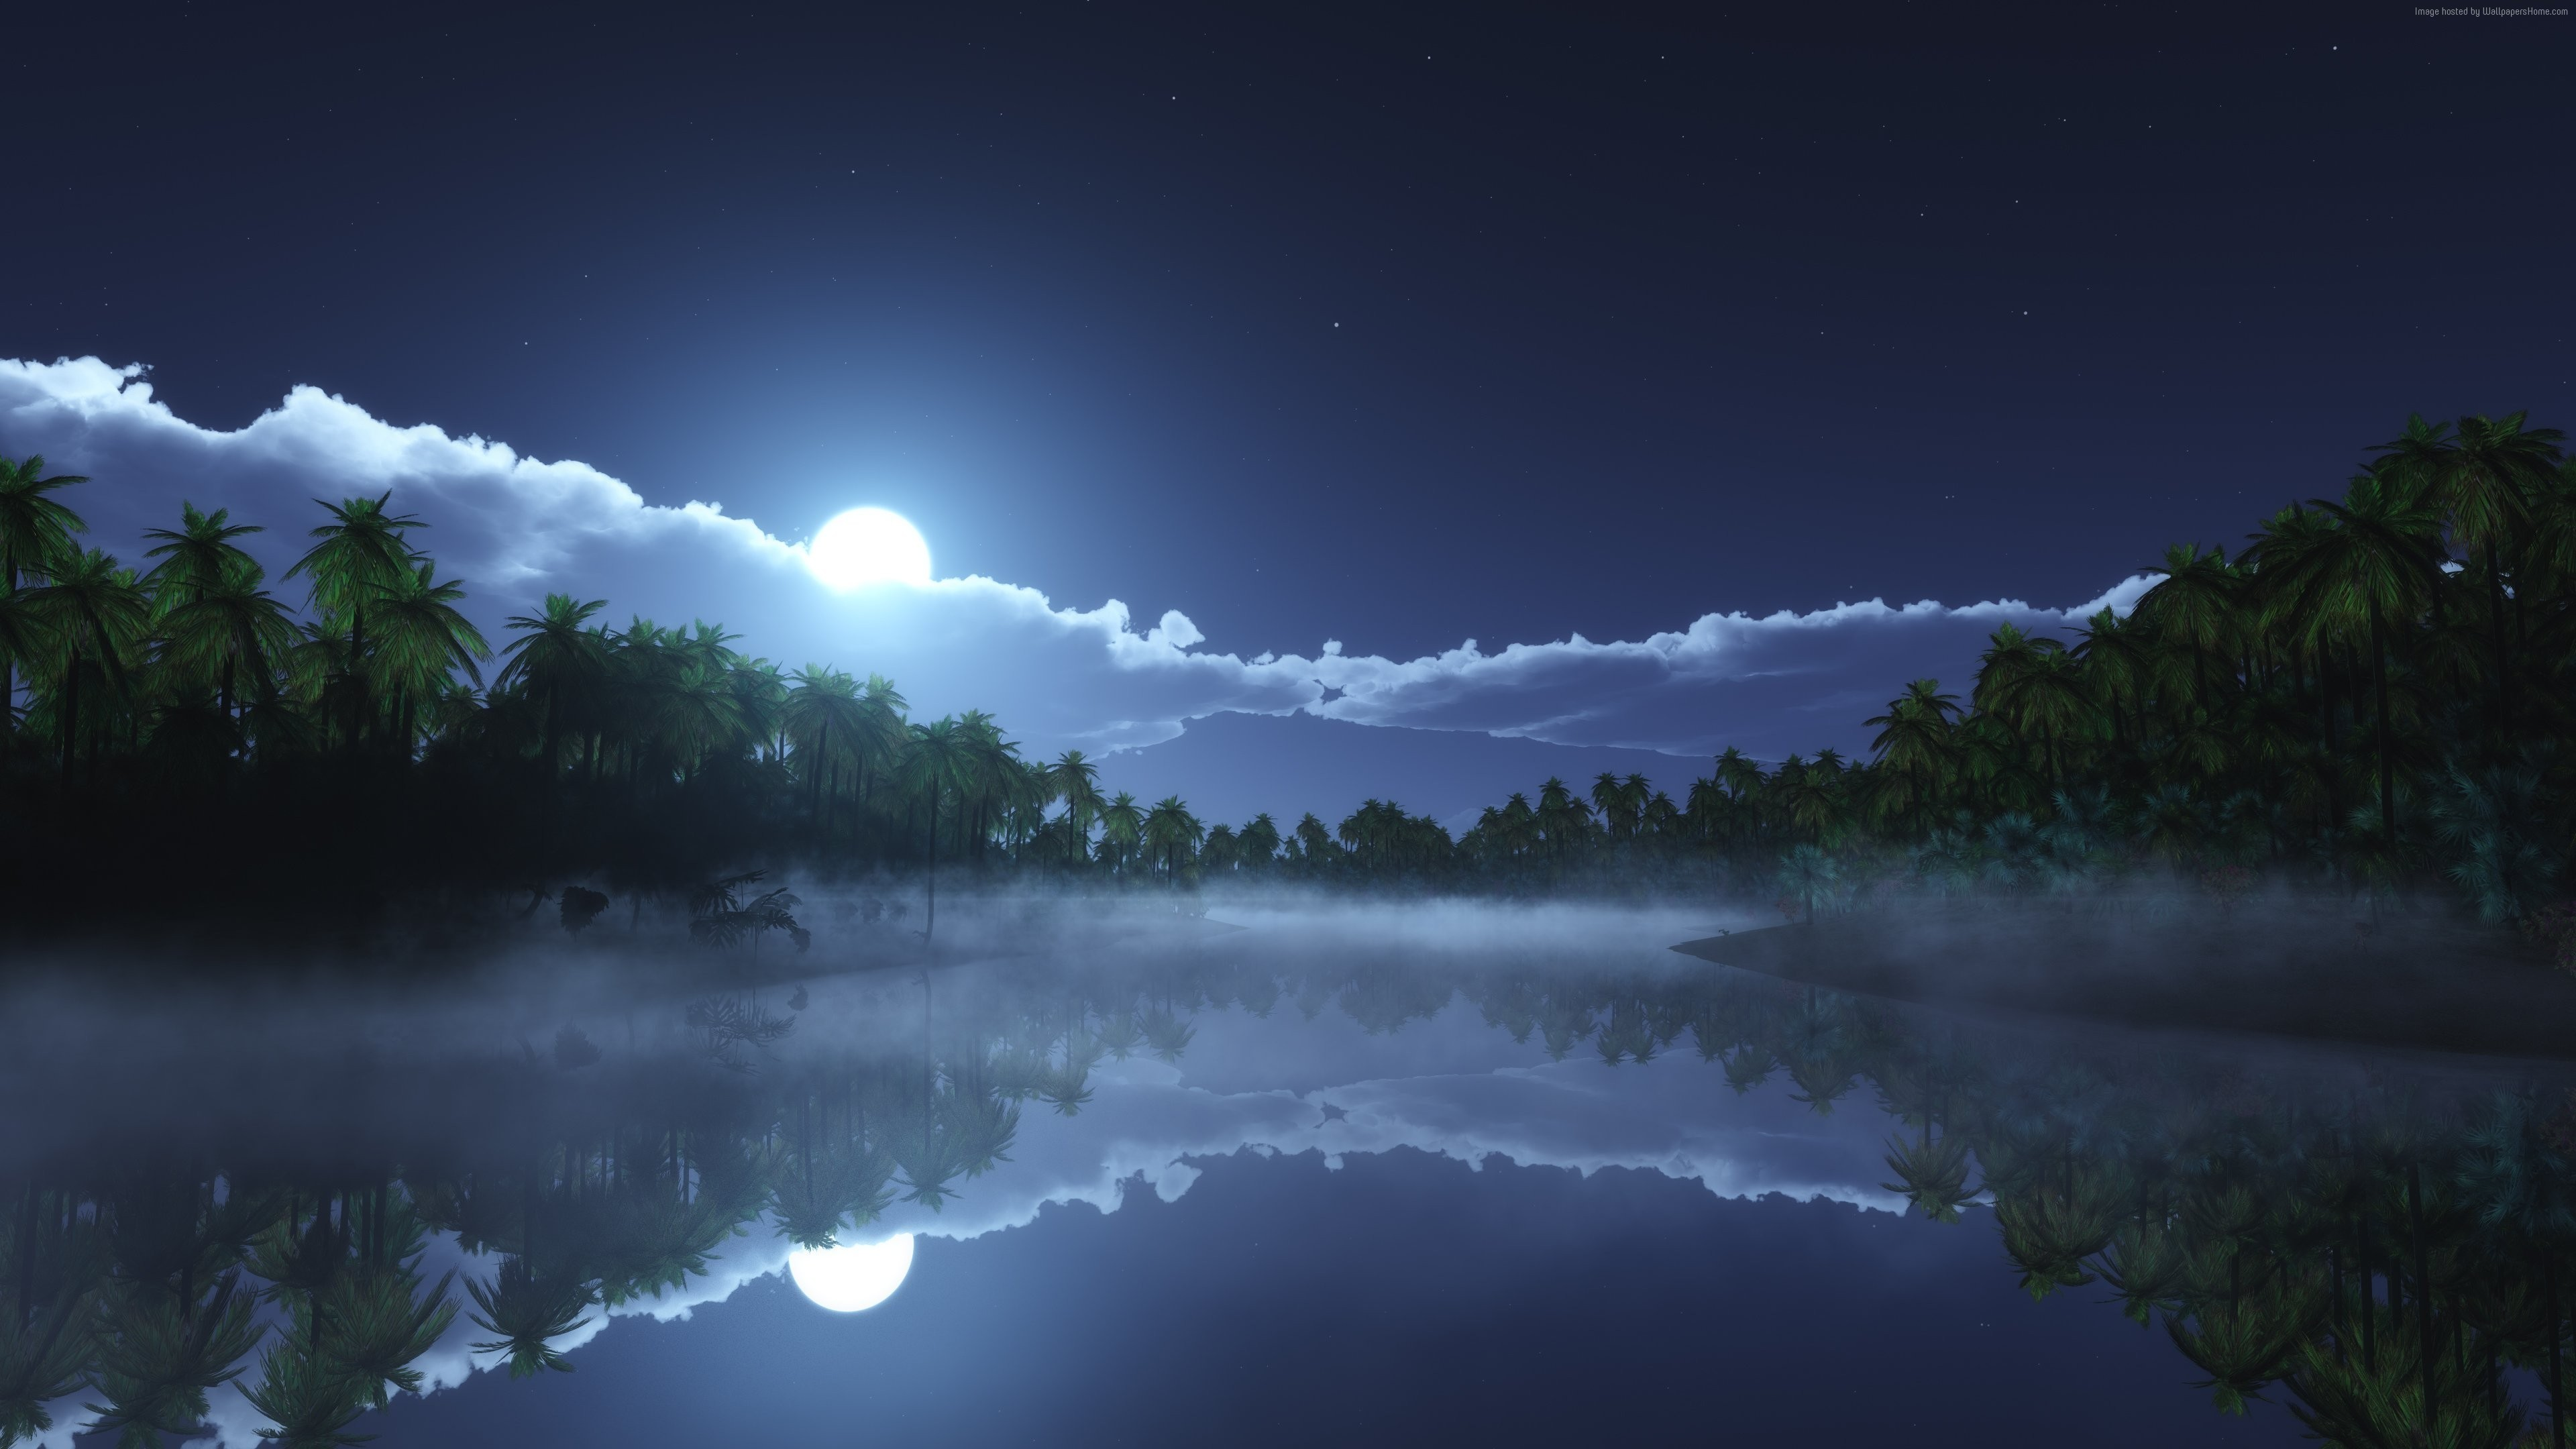 4k Wallpaper: 4K Night Sky Wallpaper (37+ Images